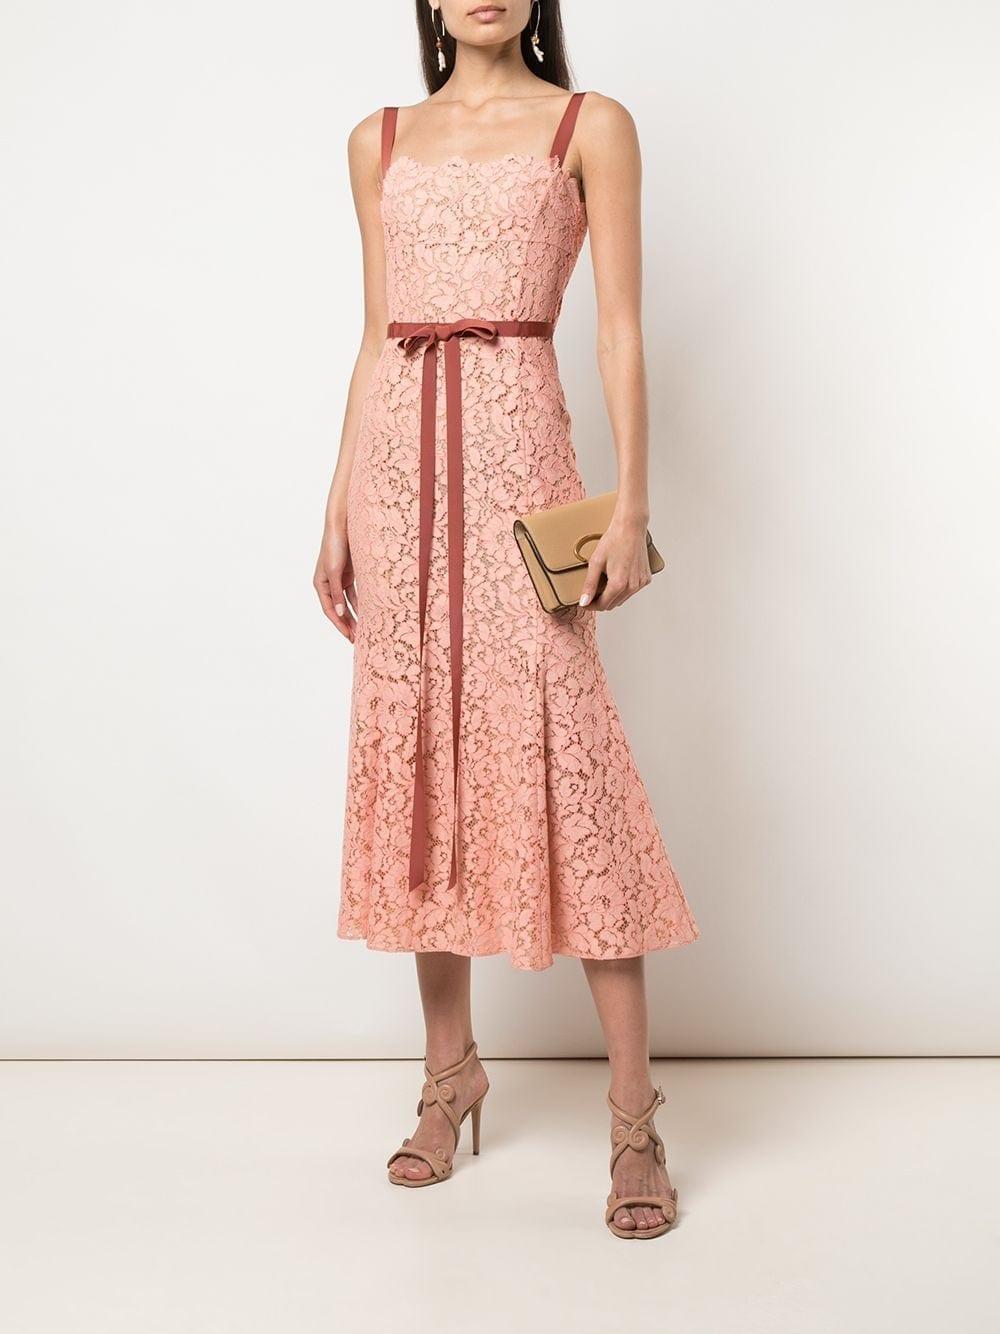 OSCAR DE LA RENTA Lace Fishtail Dress